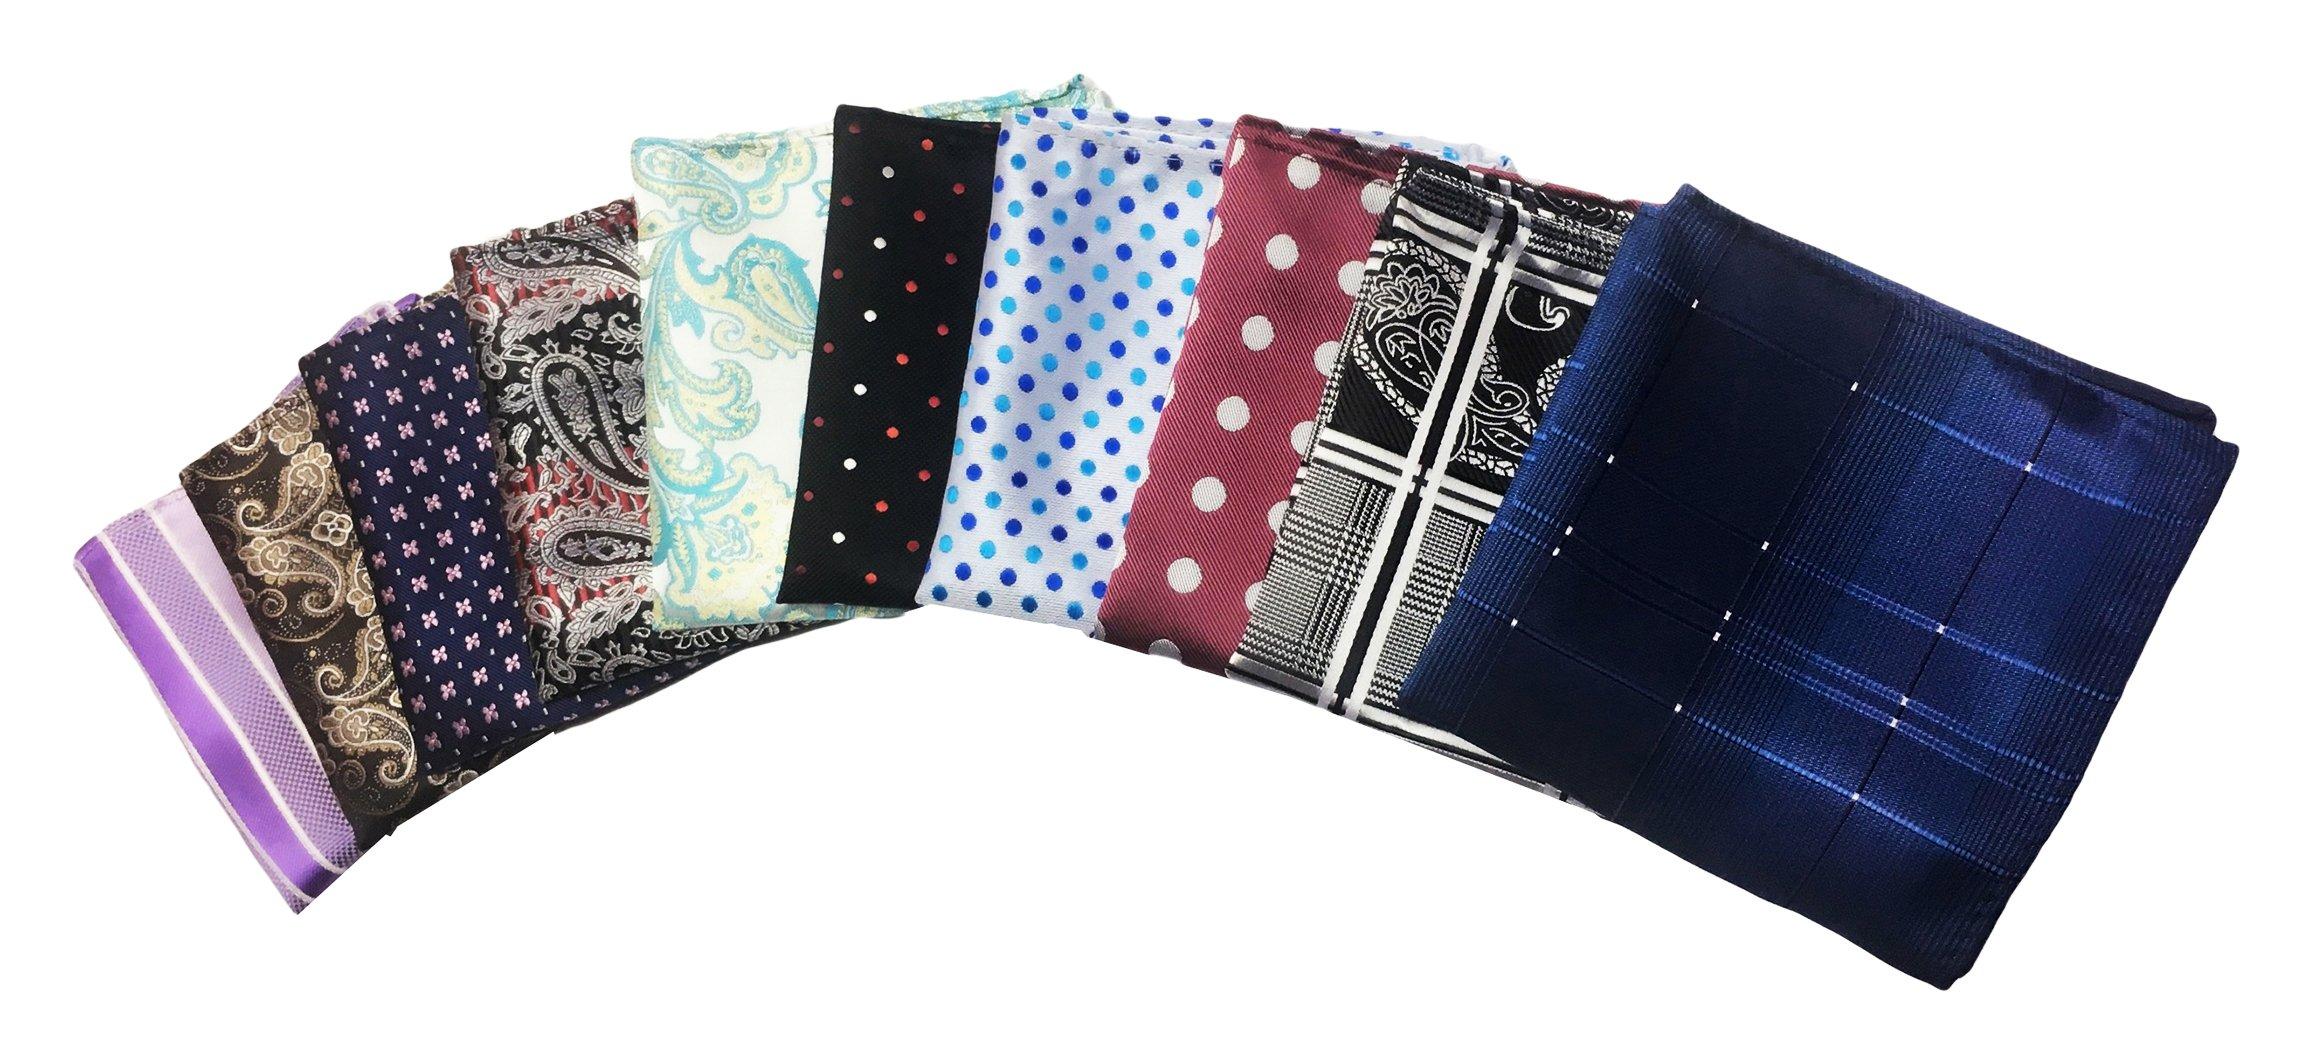 MENDENG Men's 10 Pack Polka Dot Paisley Assorted Pocket Square Silk Handkerchief